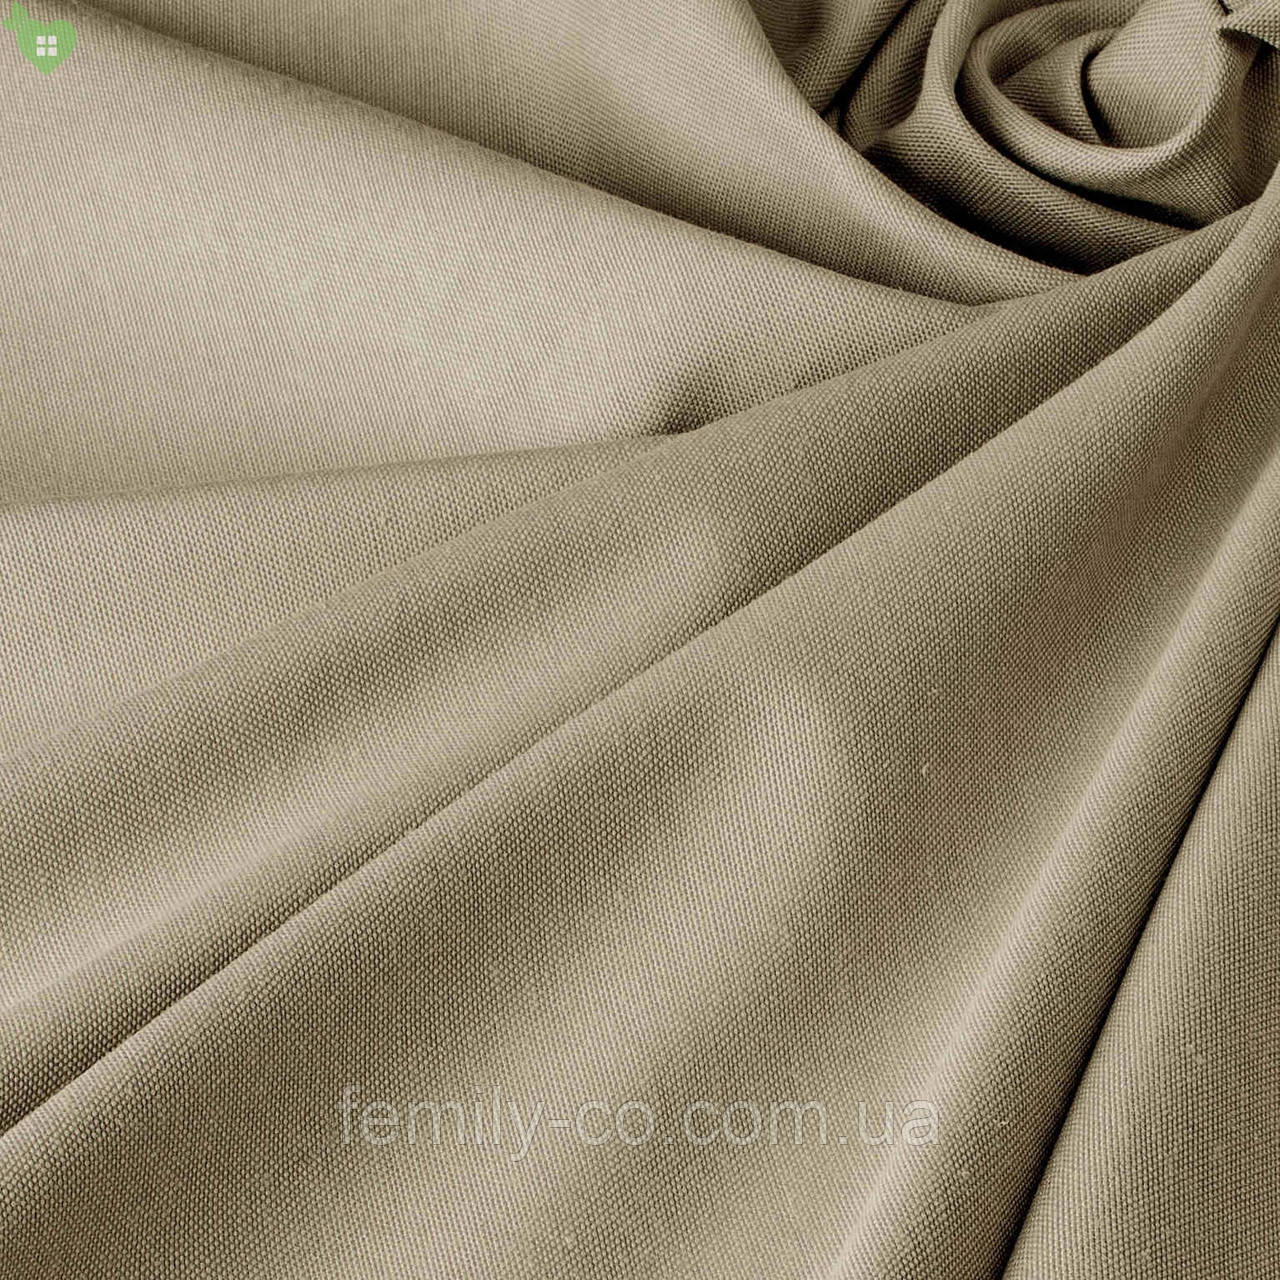 Однотонная декоративная ткань серо-бежевая с тефлоном 82756